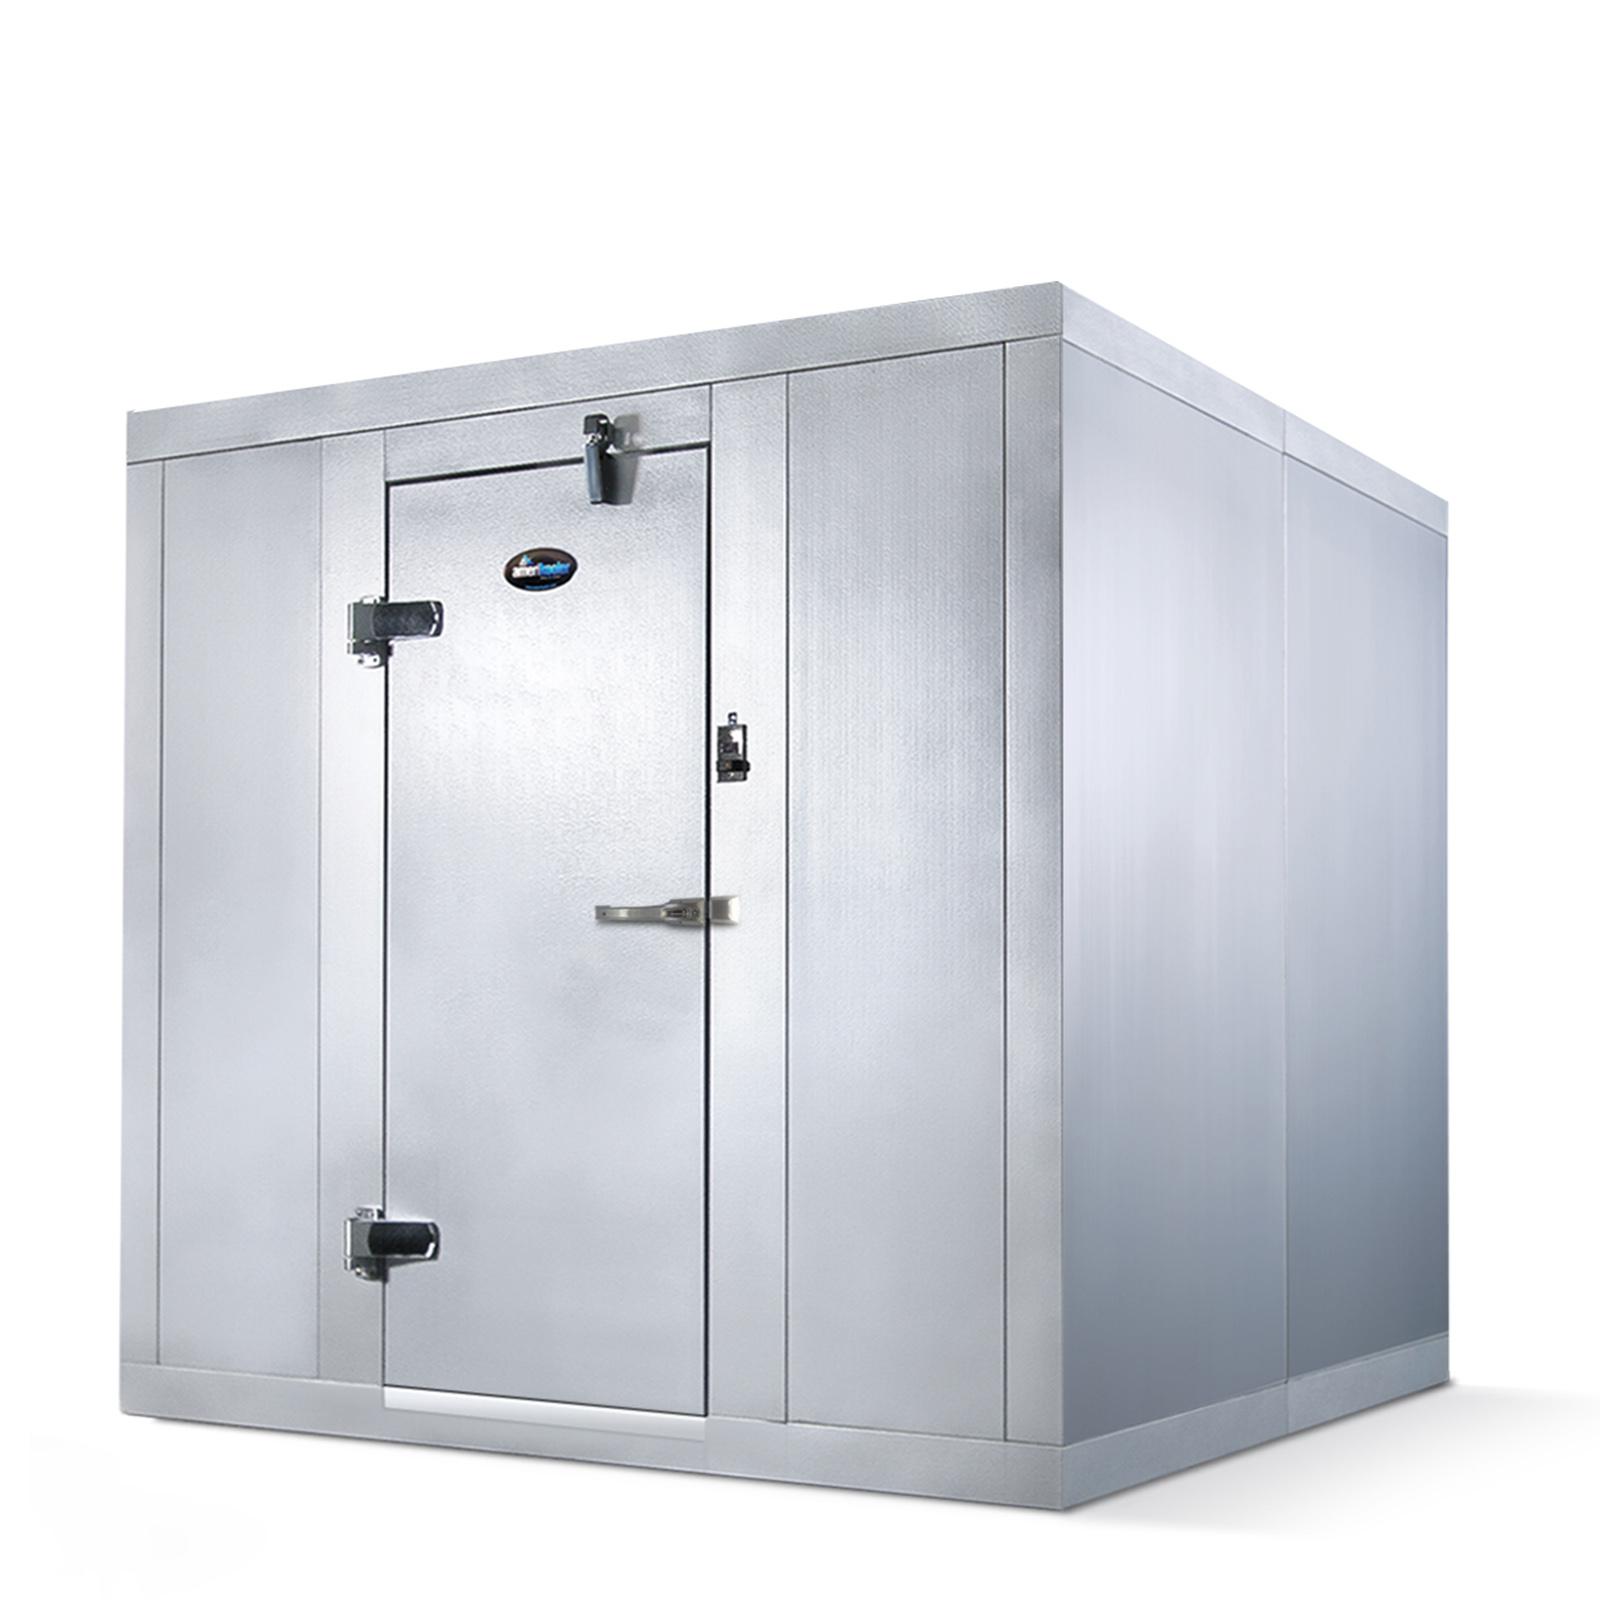 AmeriKooler DF090977**FBRF walk in freezer, modular, remote